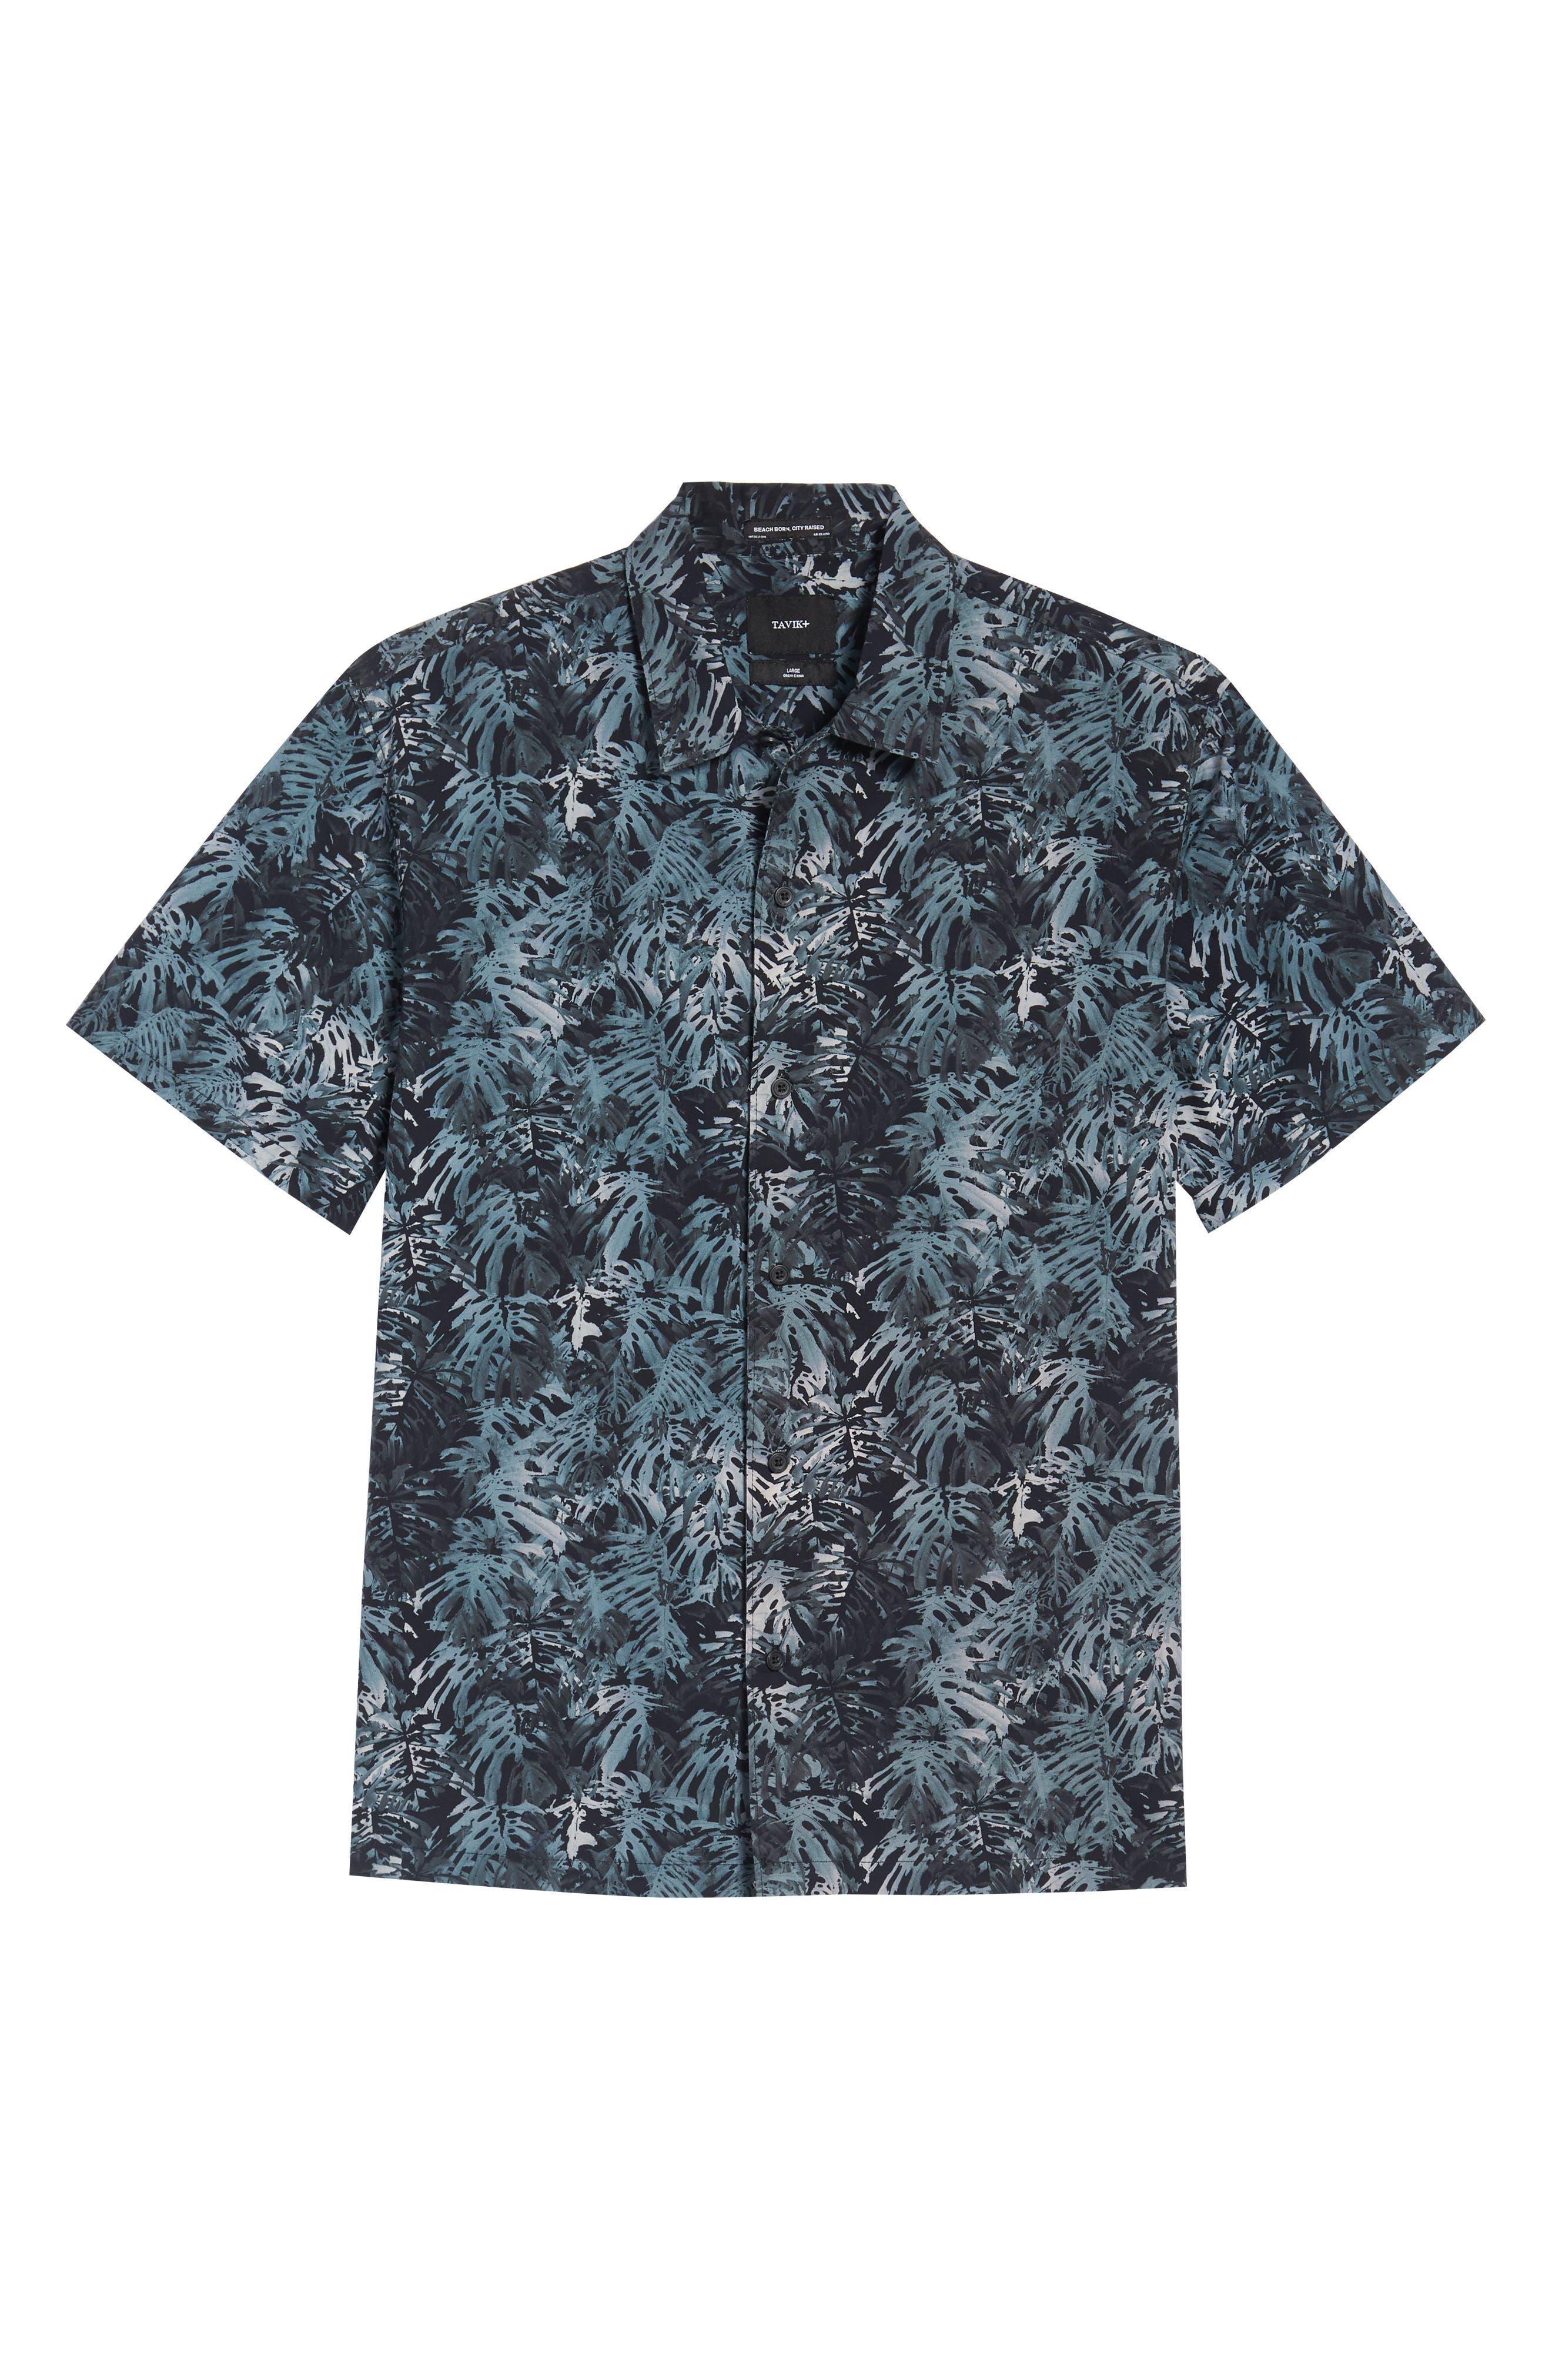 Villa Palms Short Sleeve Woven Shirt,                             Alternate thumbnail 6, color,                             991